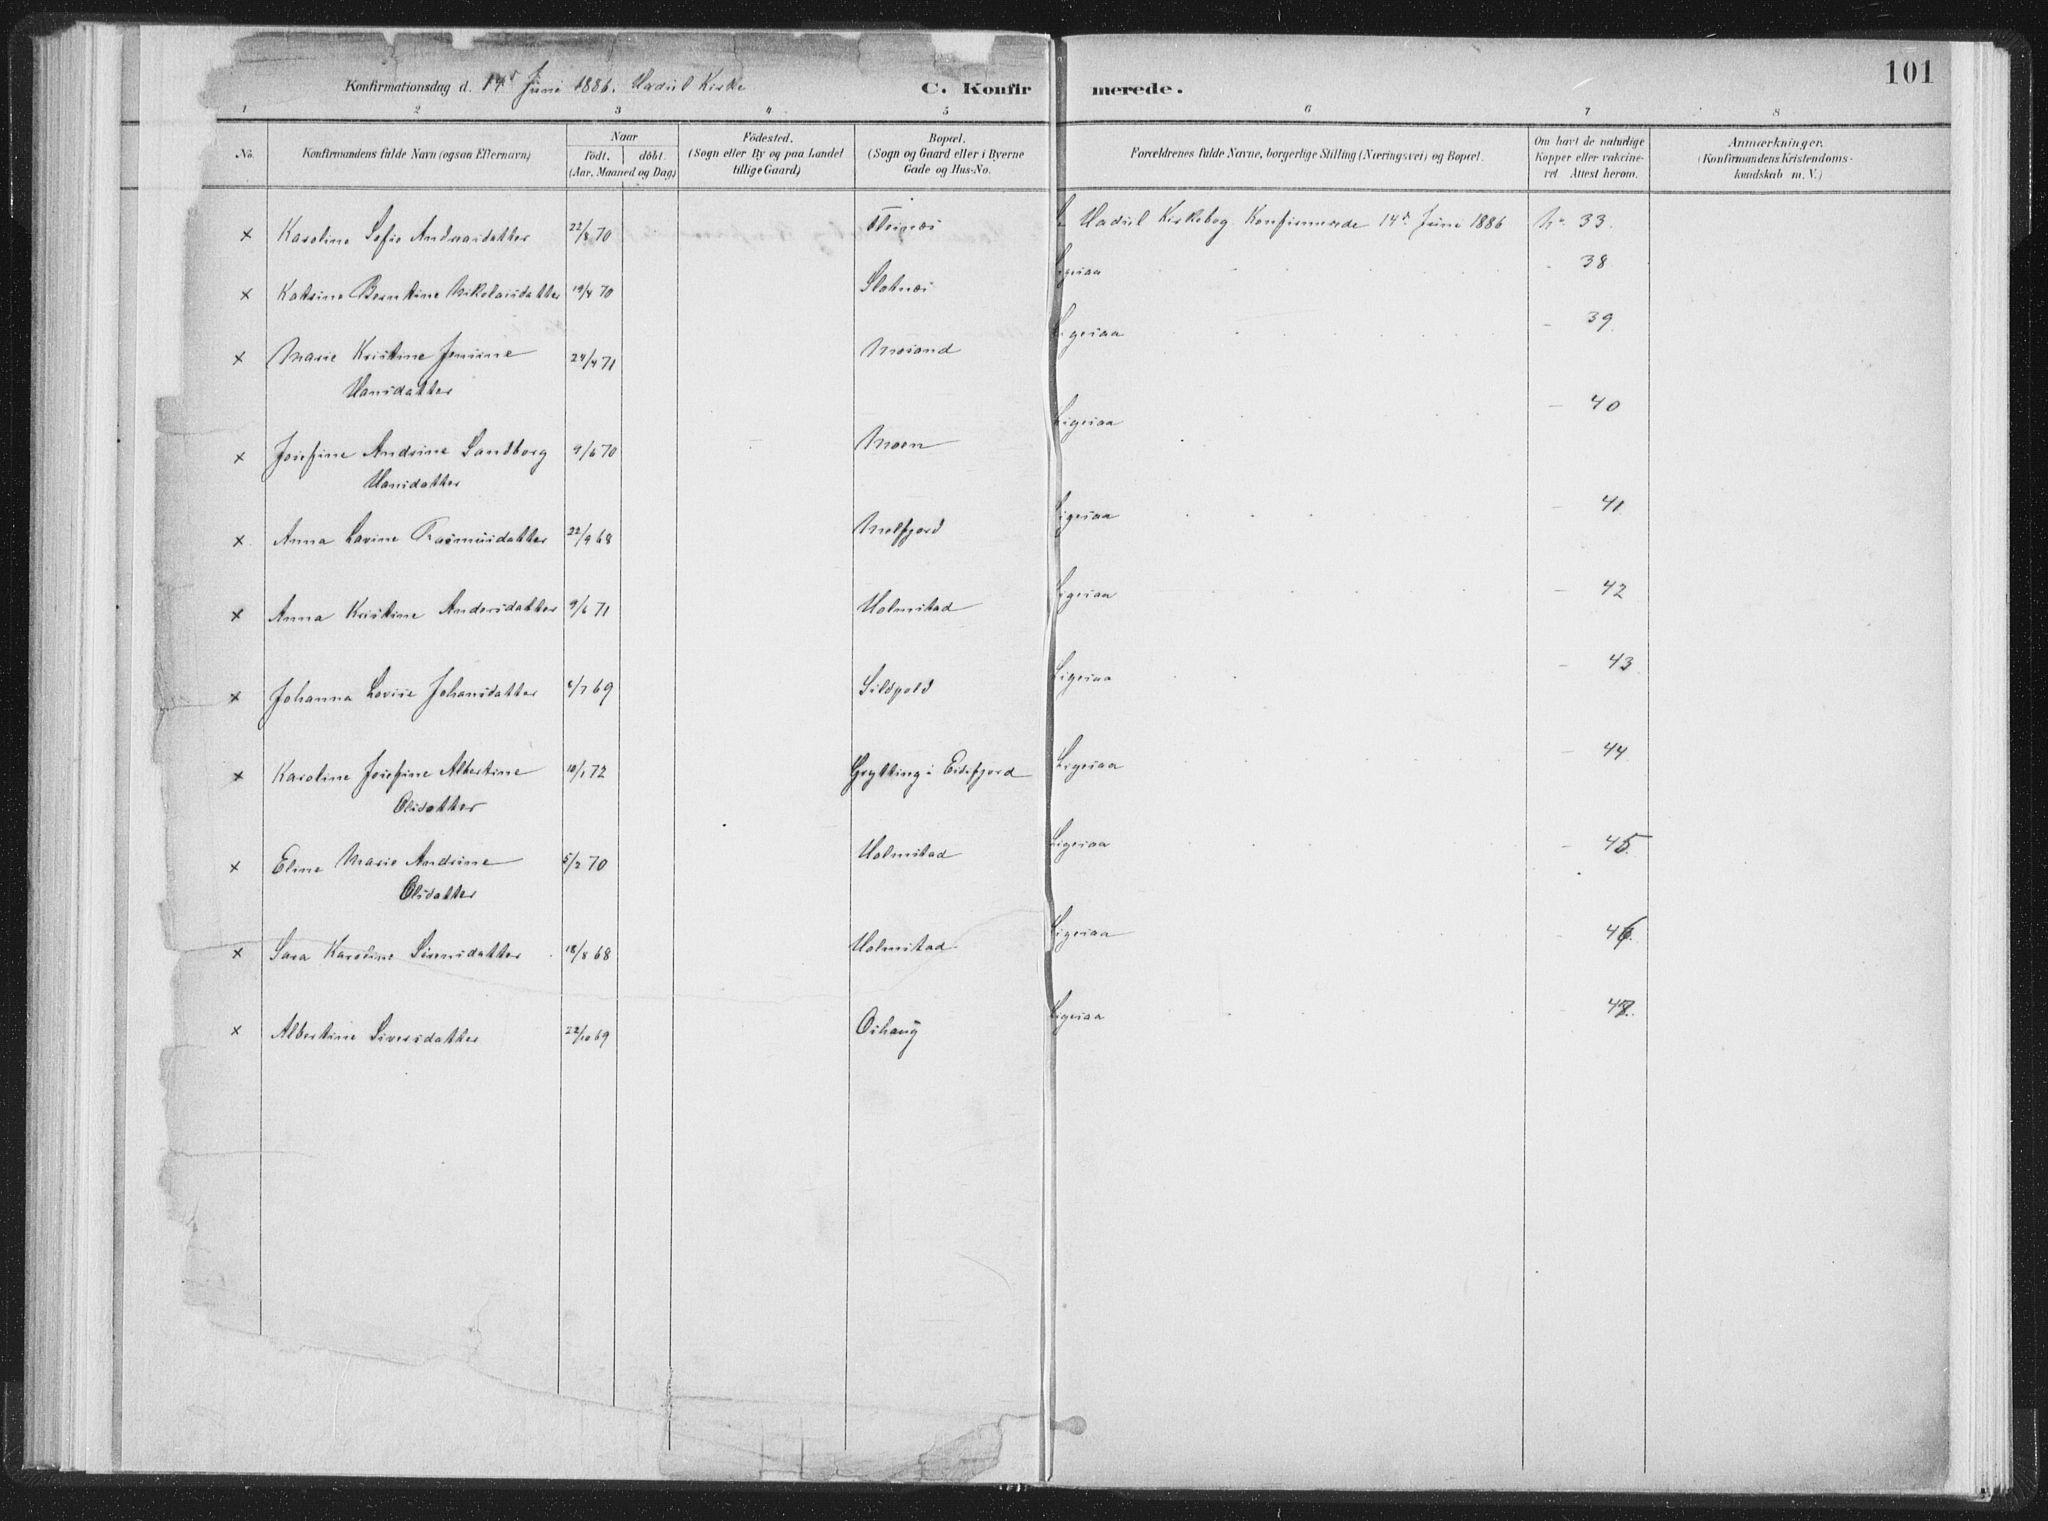 SAT, Ministerialprotokoller, klokkerbøker og fødselsregistre - Nordland, 890/L1286: Ministerialbok nr. 890A01, 1882-1902, s. 101